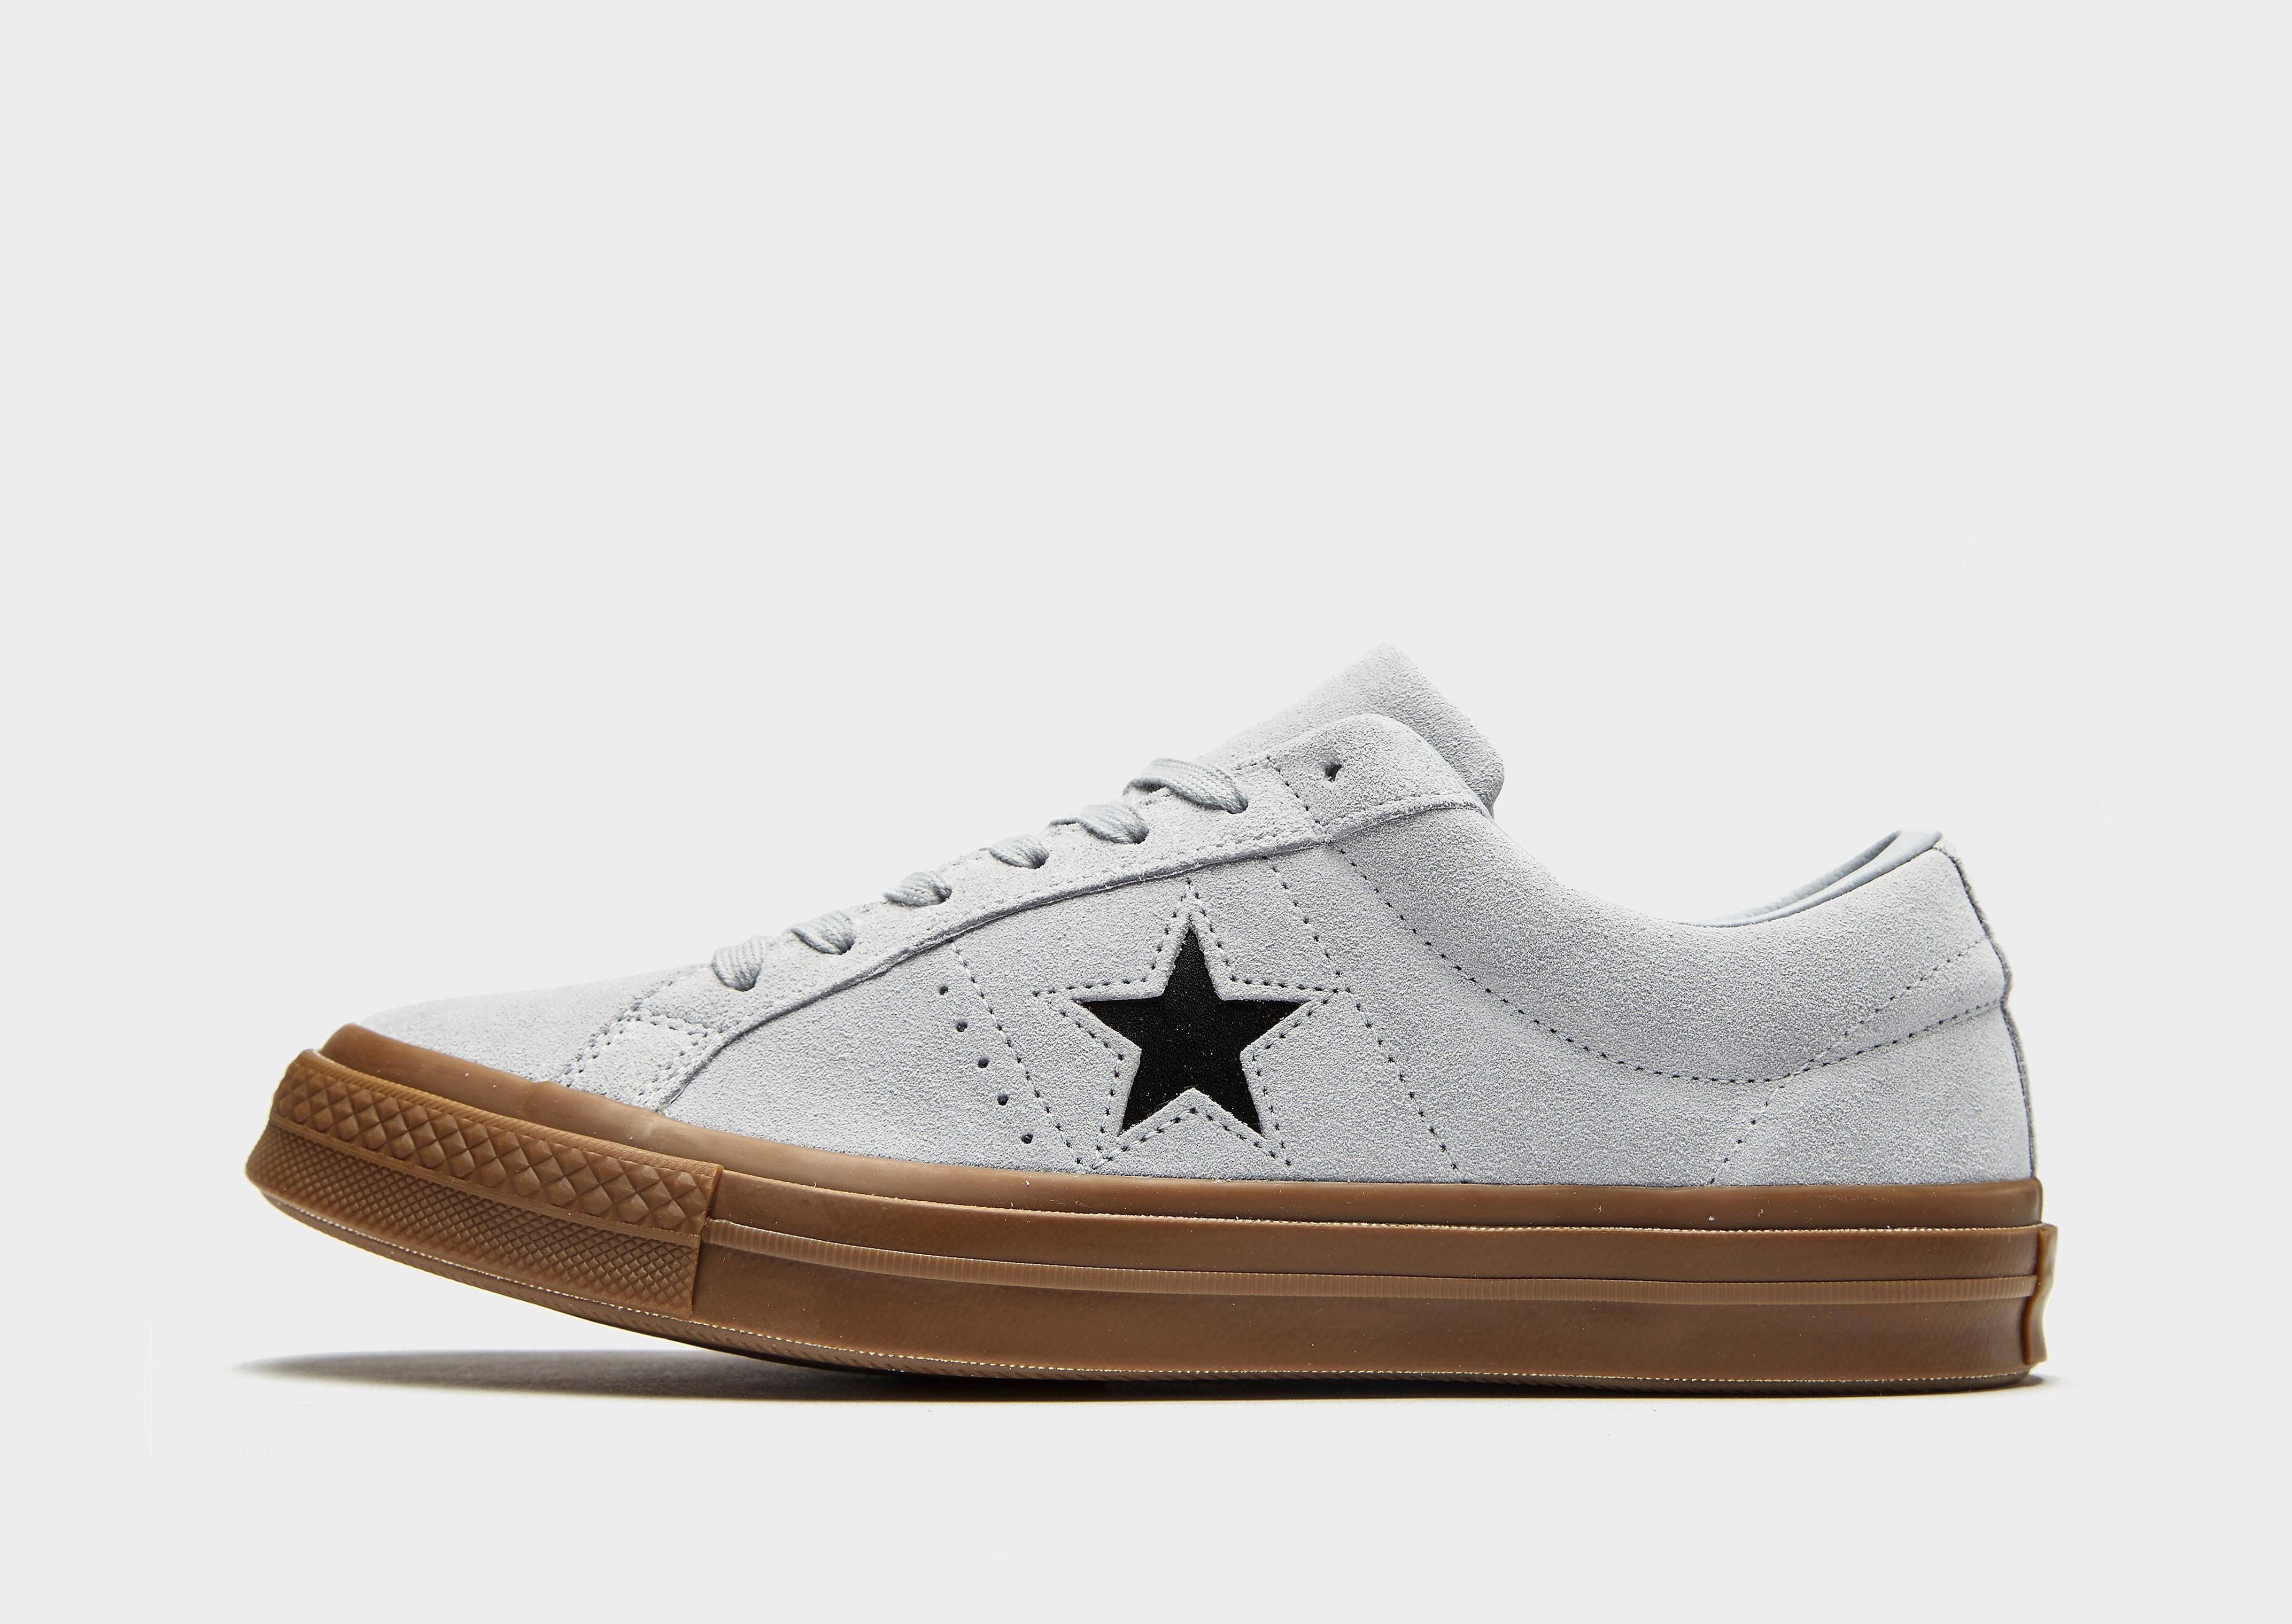 Converse One Star Suede